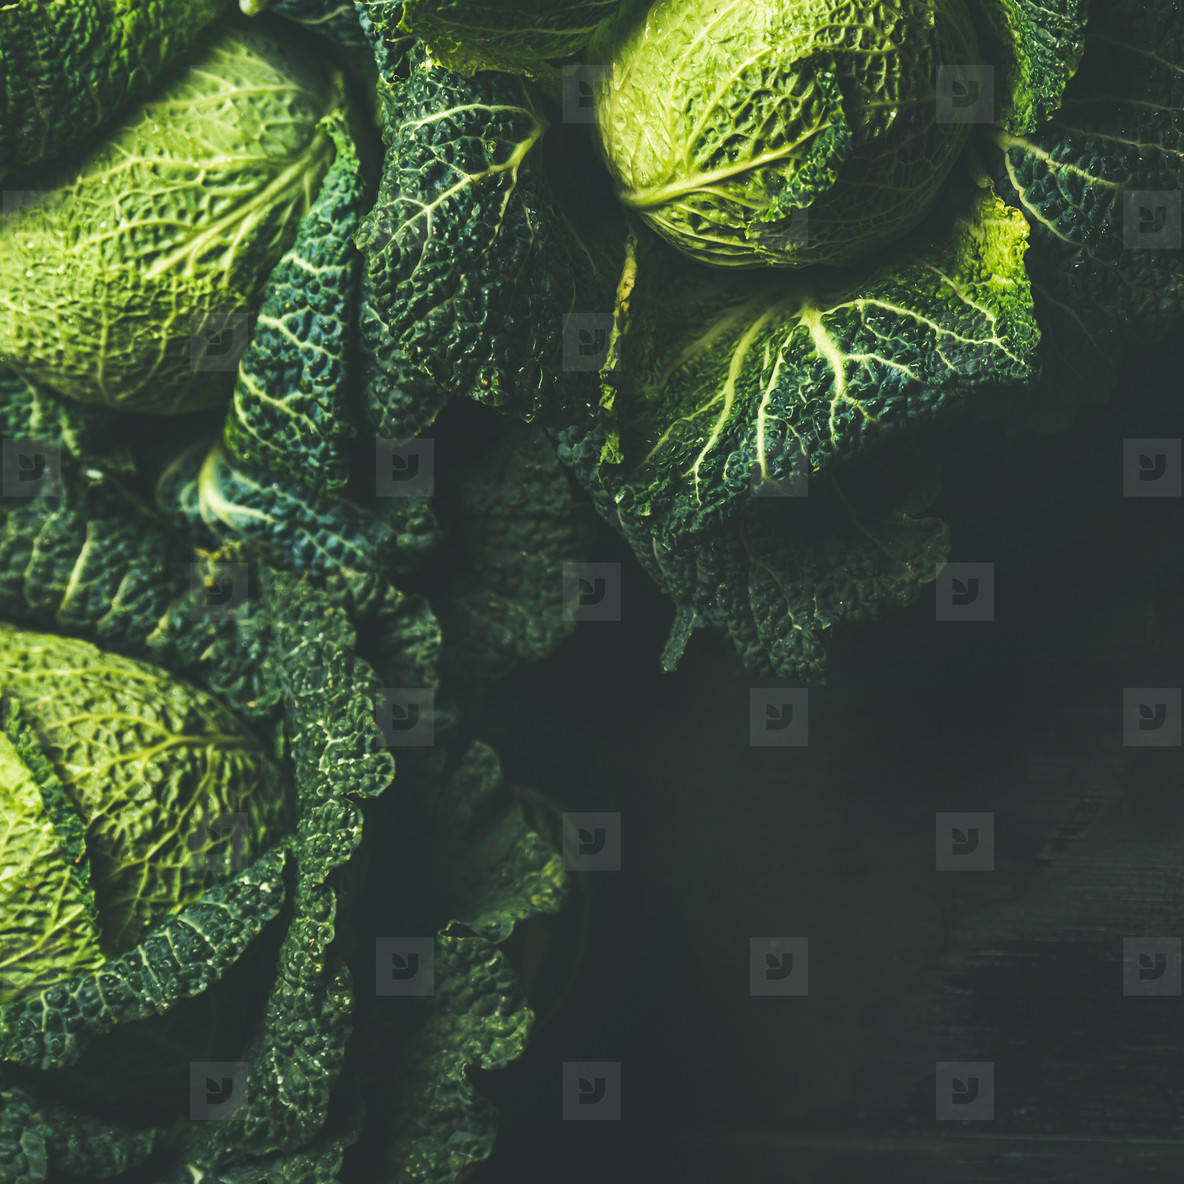 Raw fresh uncooked green cabbage  dark background  square crop